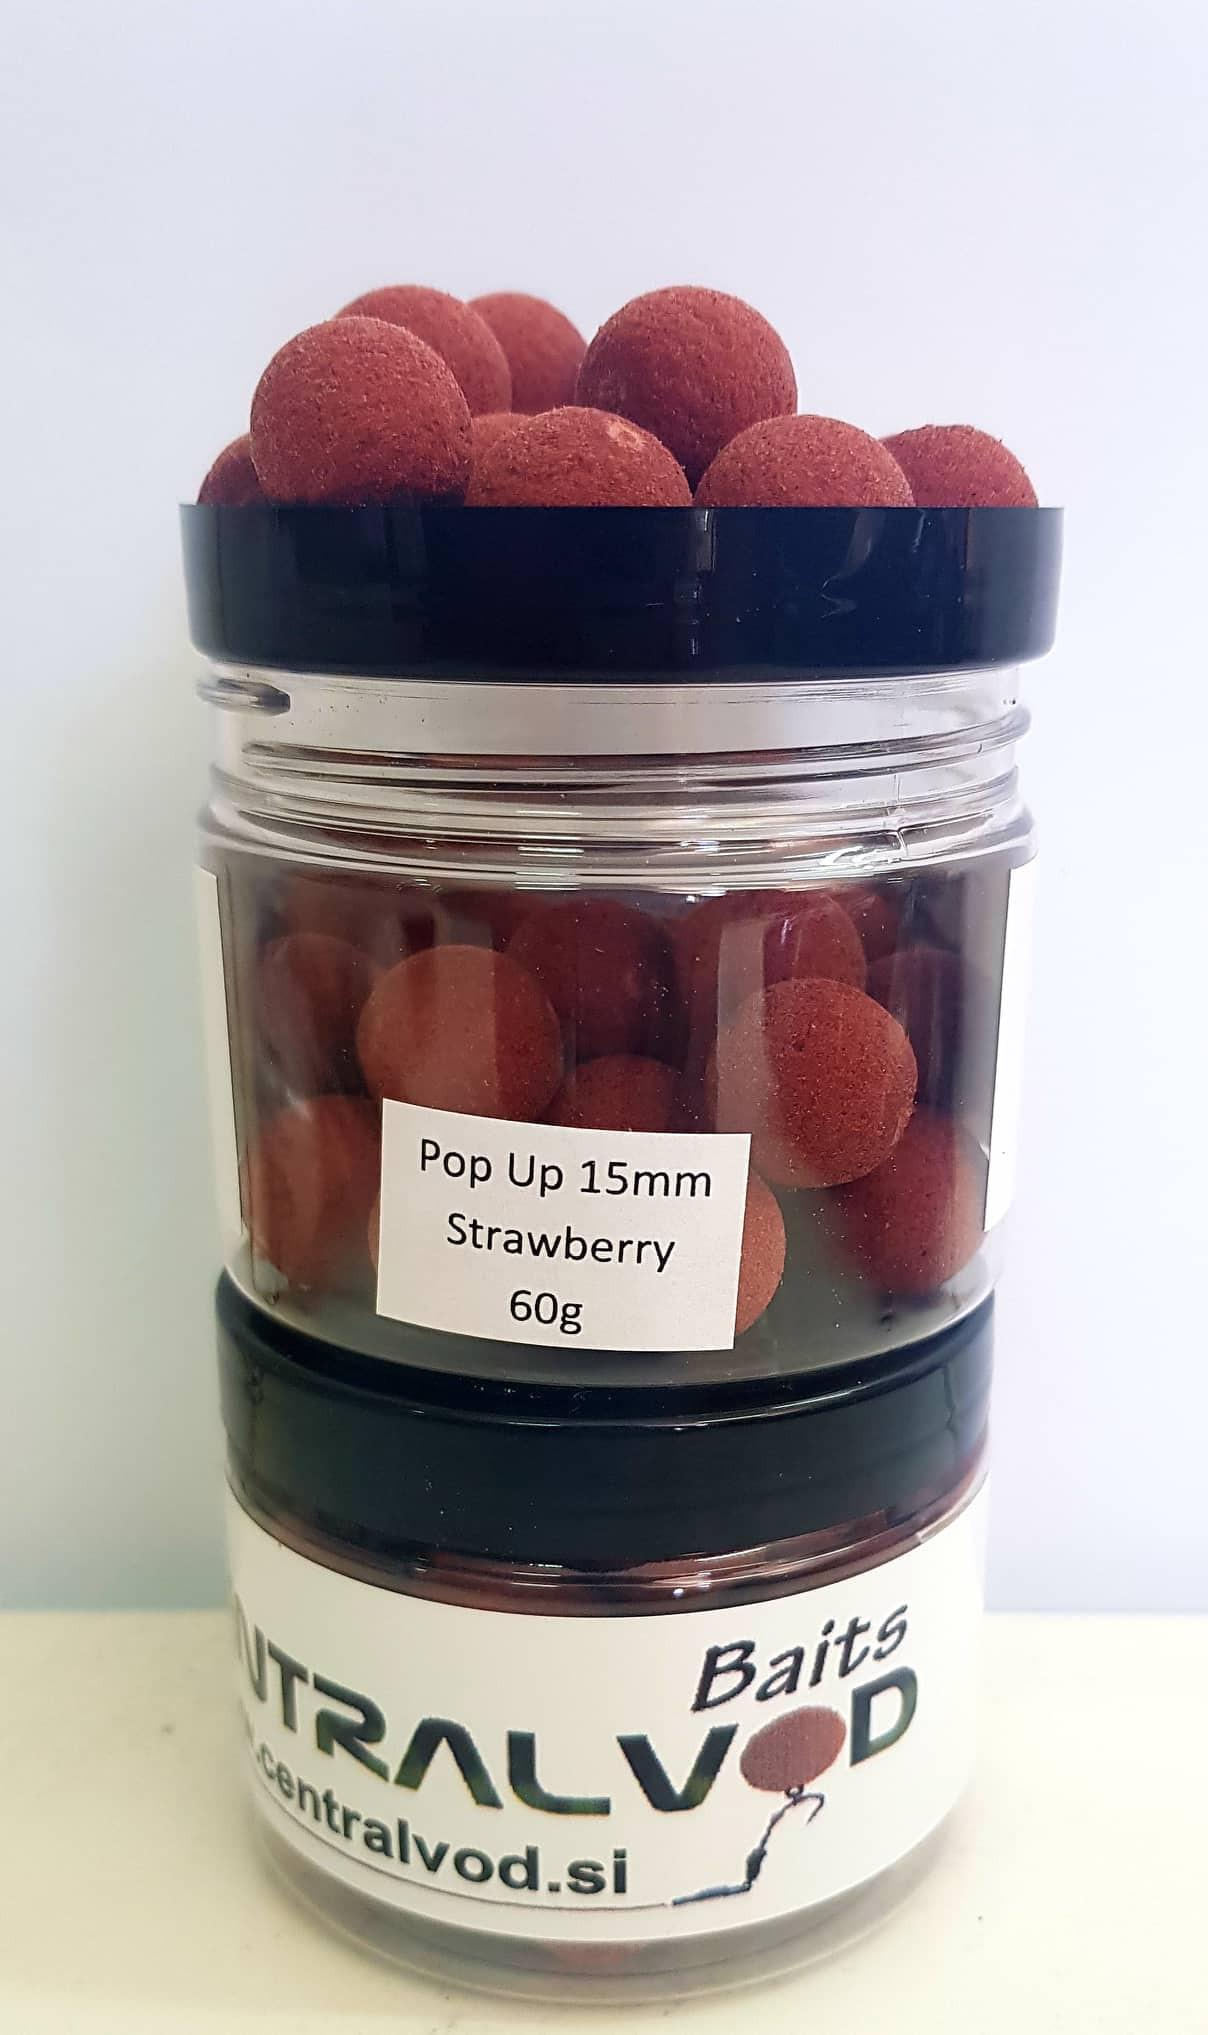 Pop Up Bojli Centralvod Baits Strawberry 15mm 60g